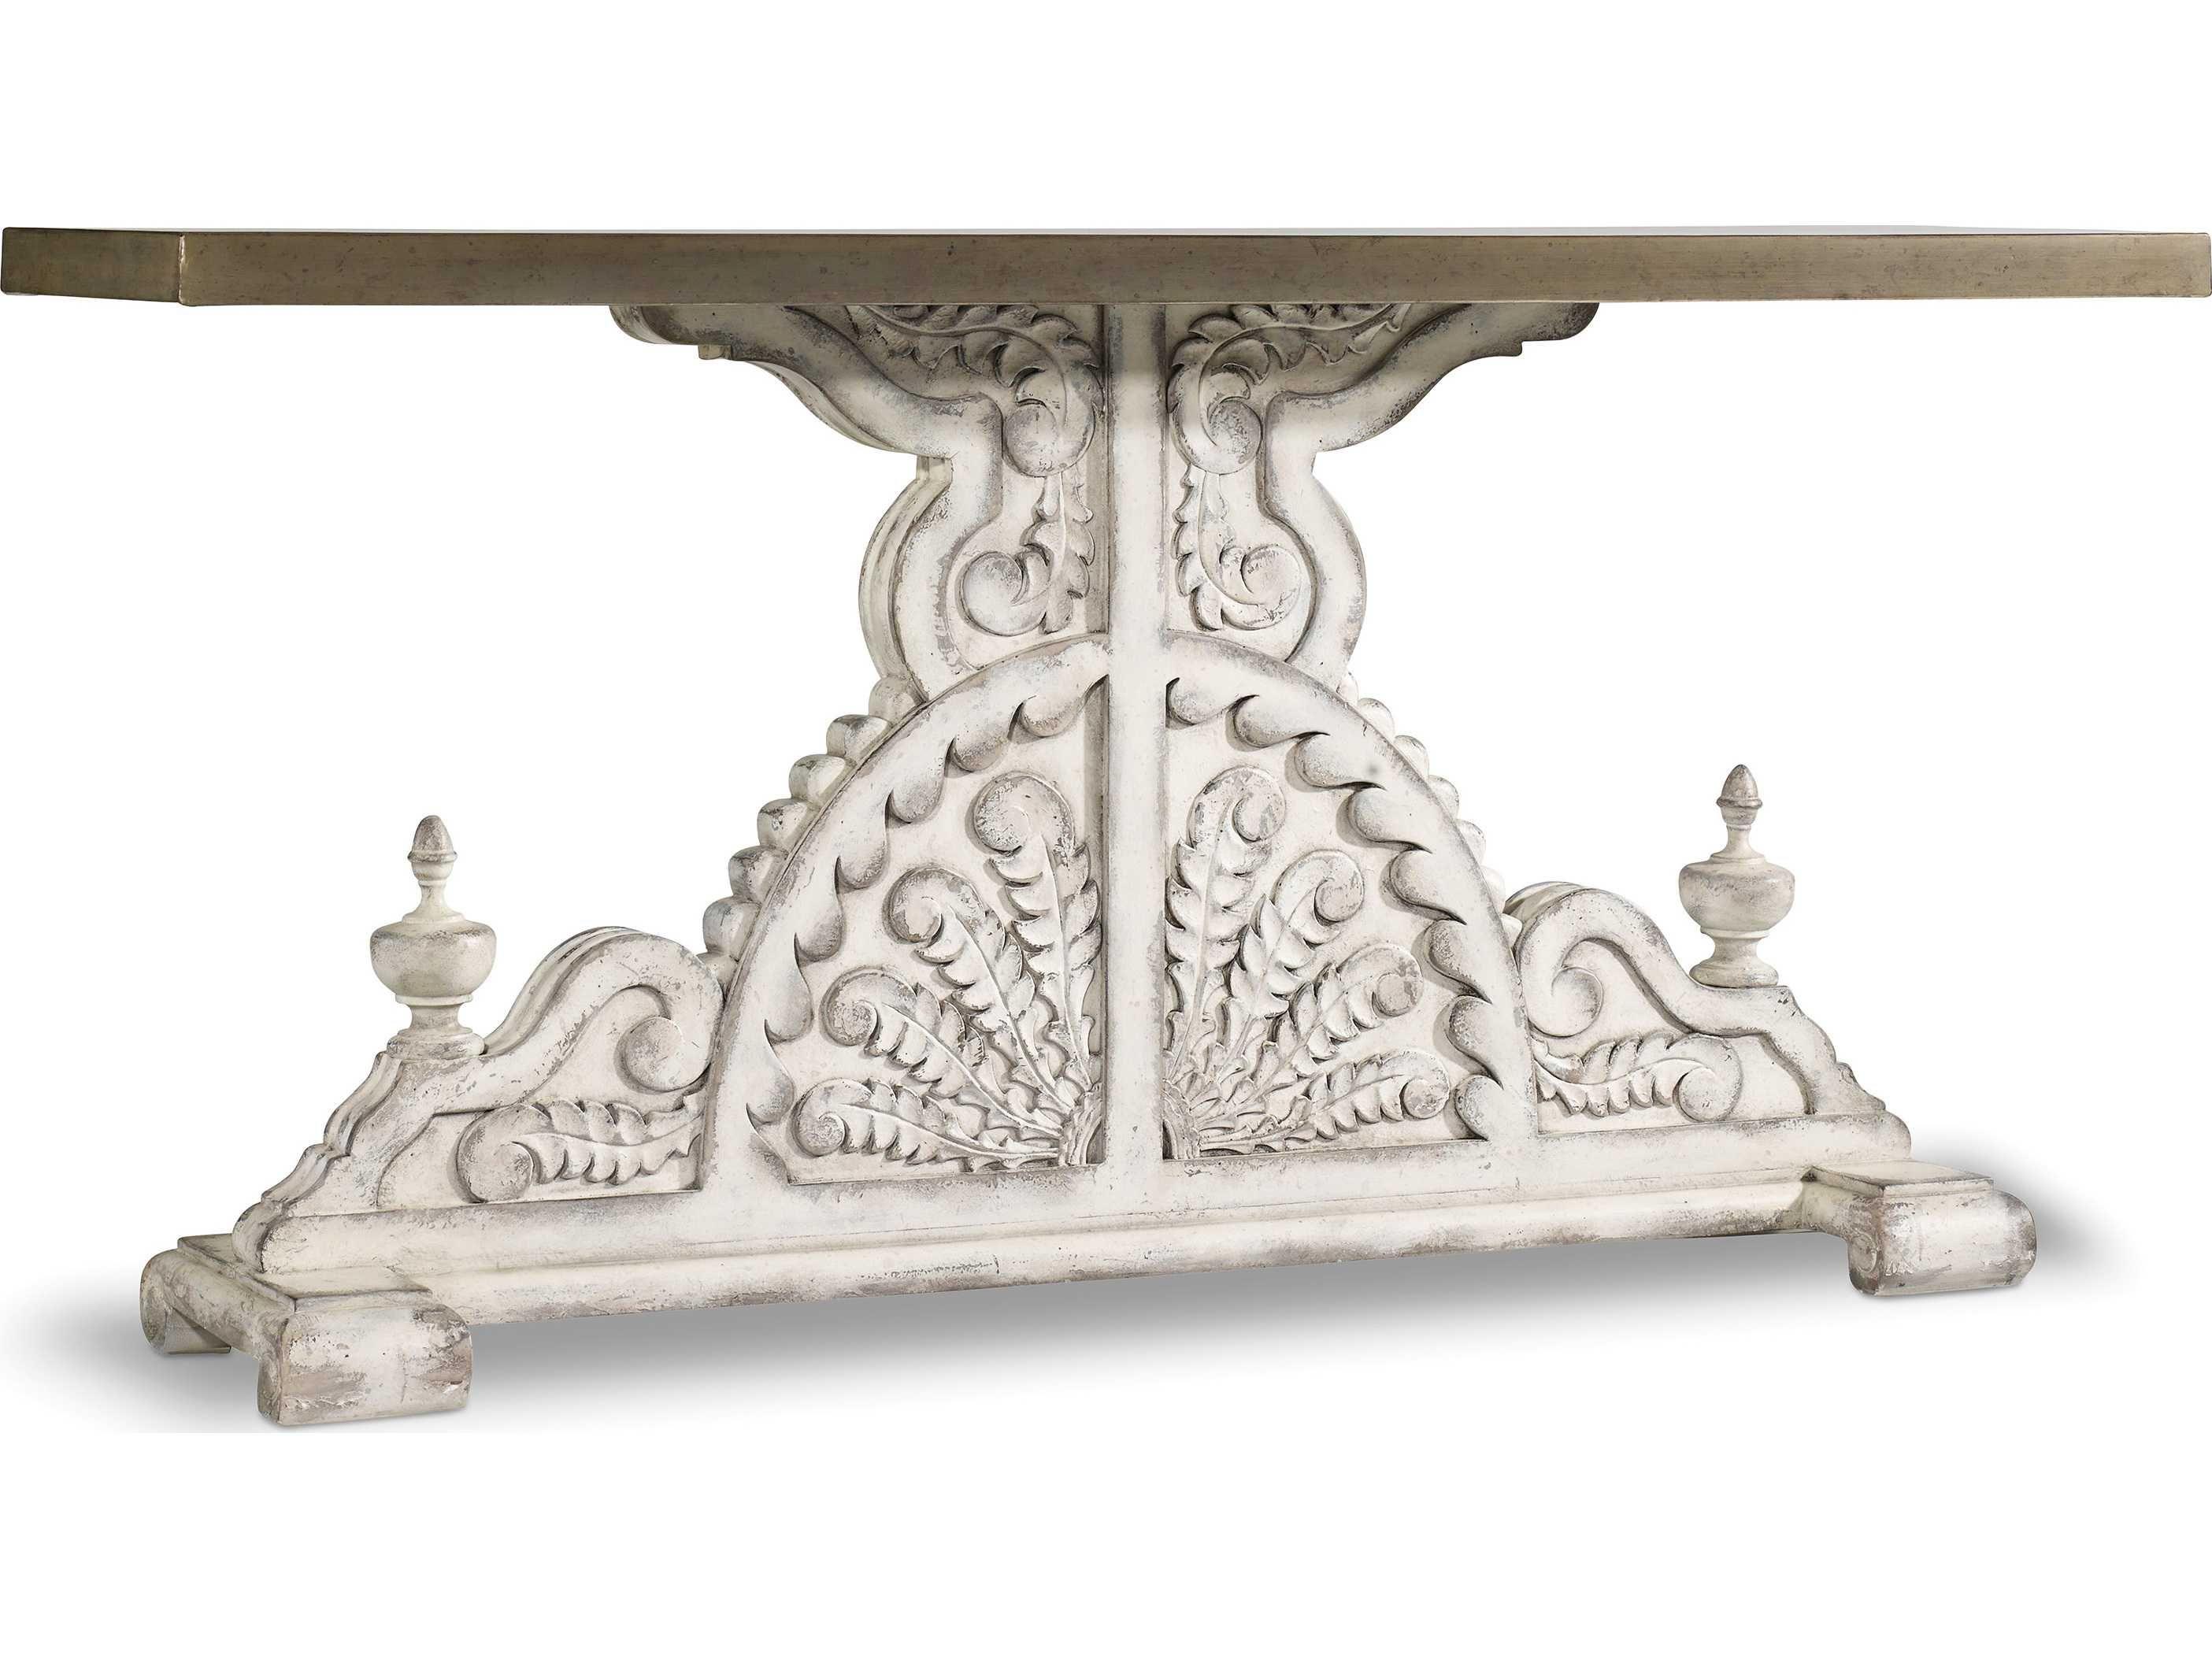 Enjoyable Hooker Furniture Sanctuary Whites Creams Beige 64L X 18 Home Interior And Landscaping Mentranervesignezvosmurscom